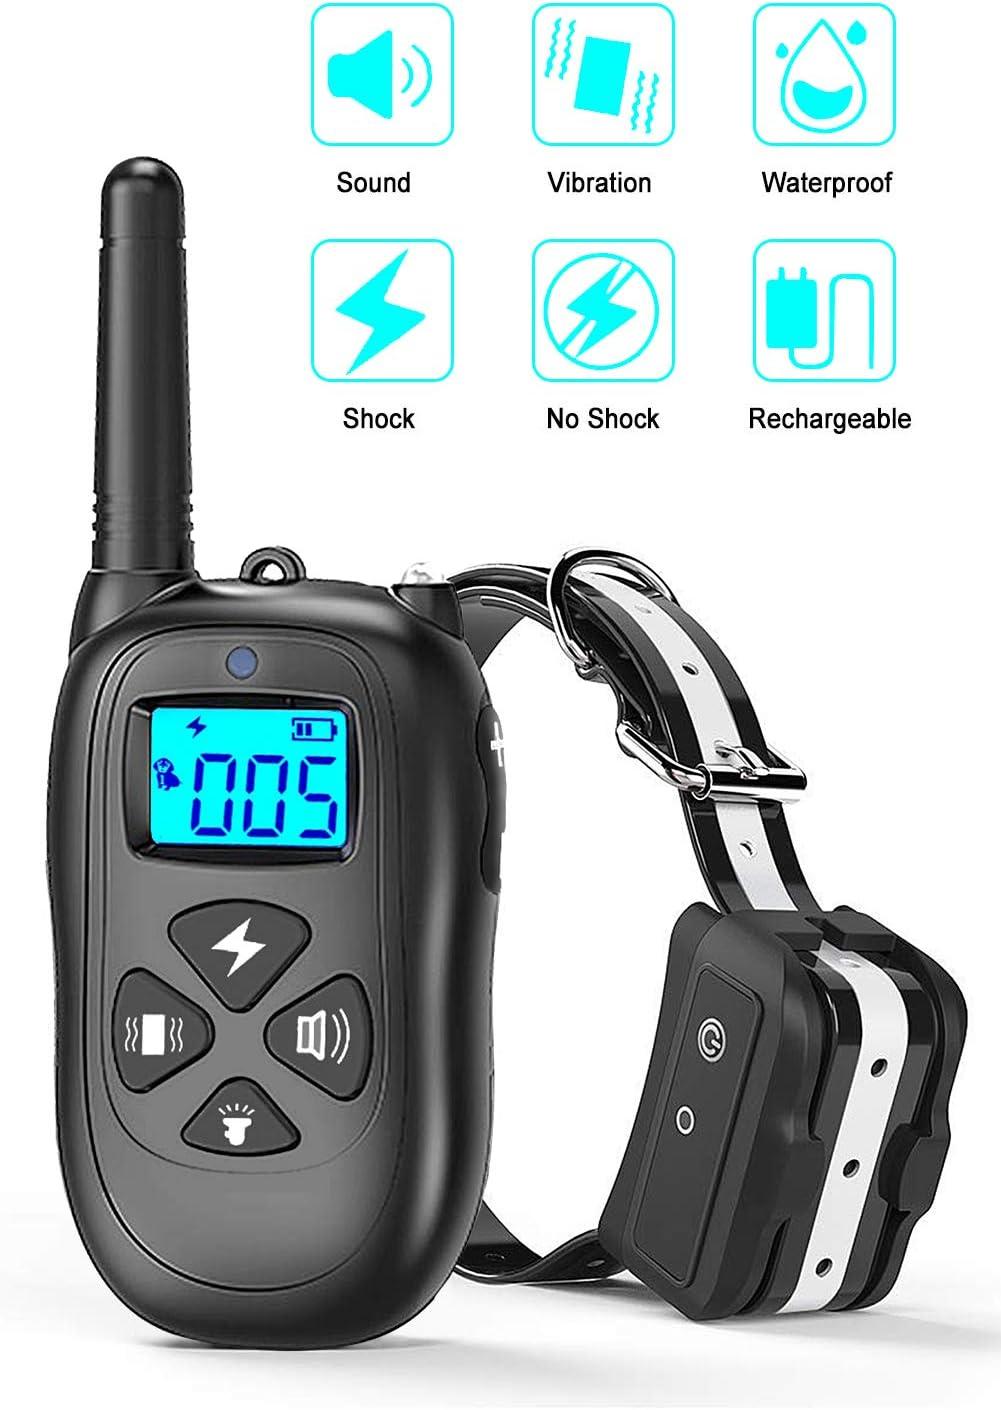 CASACOP Dog Training Collar, Dog Shock Collar 1500Ft Range Dog Collar with Remote IPX7 Waterproof Shock Collar for Small Medium Large Dog